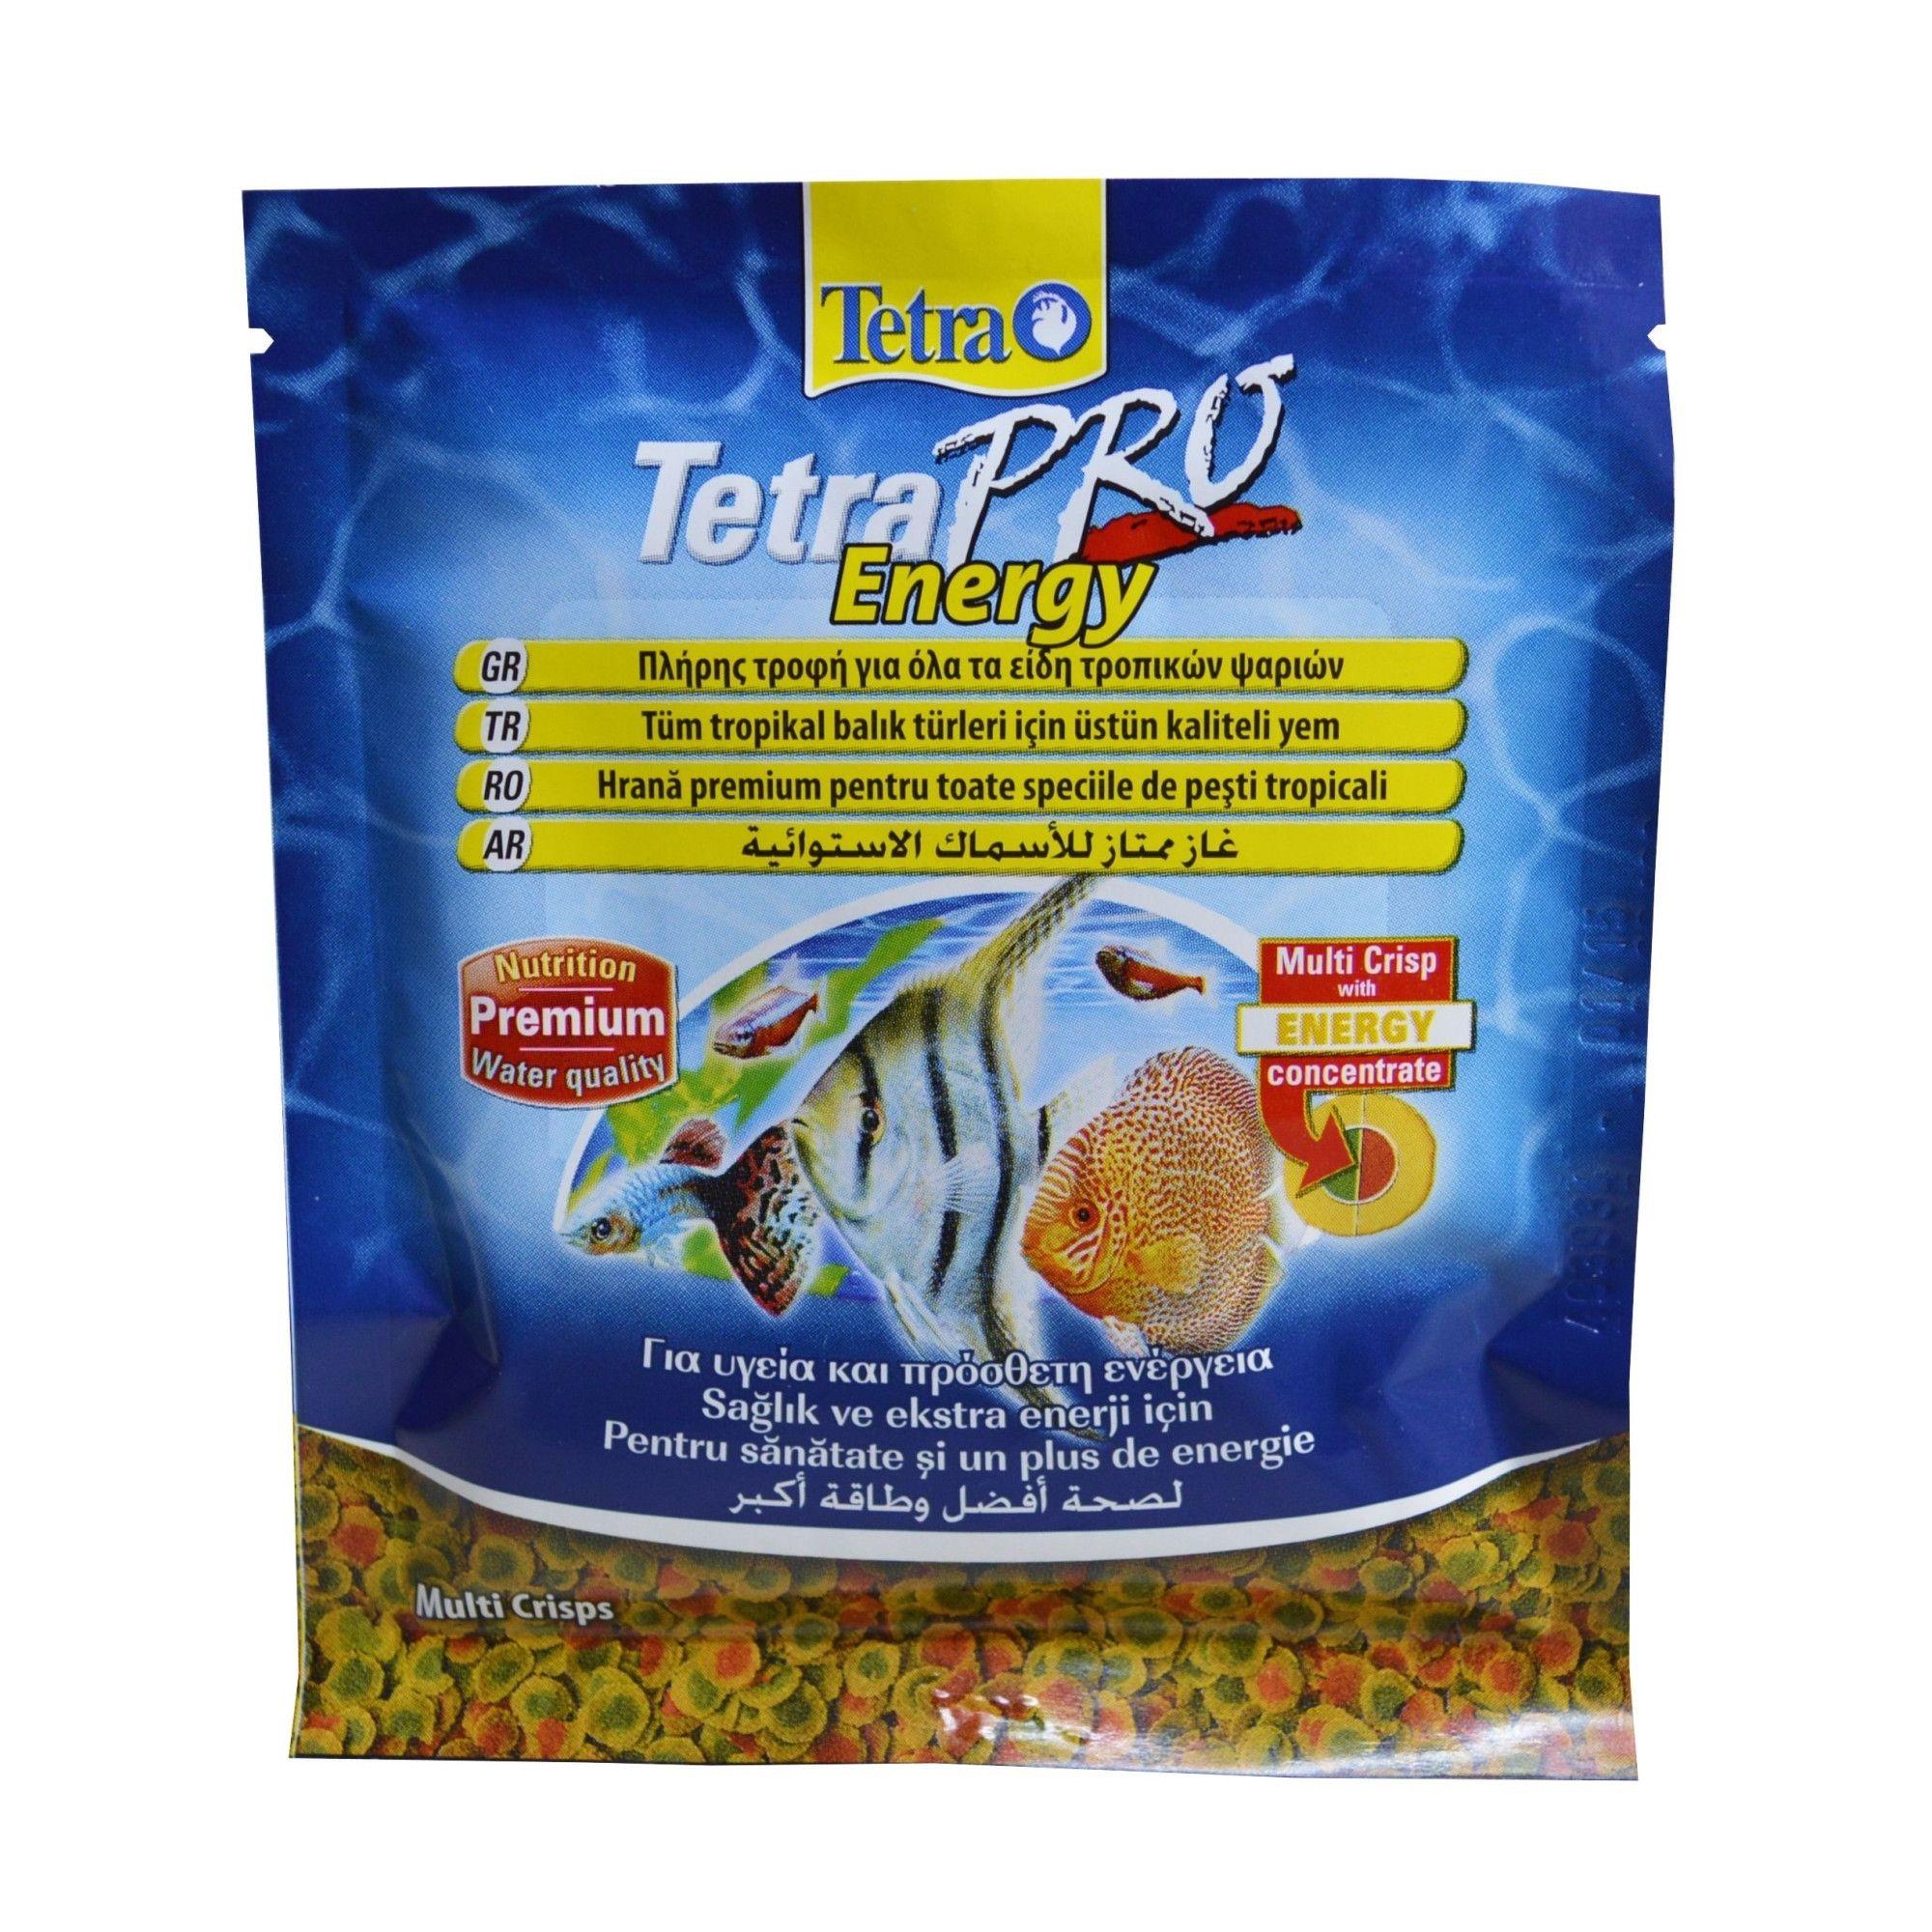 TETRA PRO ENERGY CRISPS 12g imagine